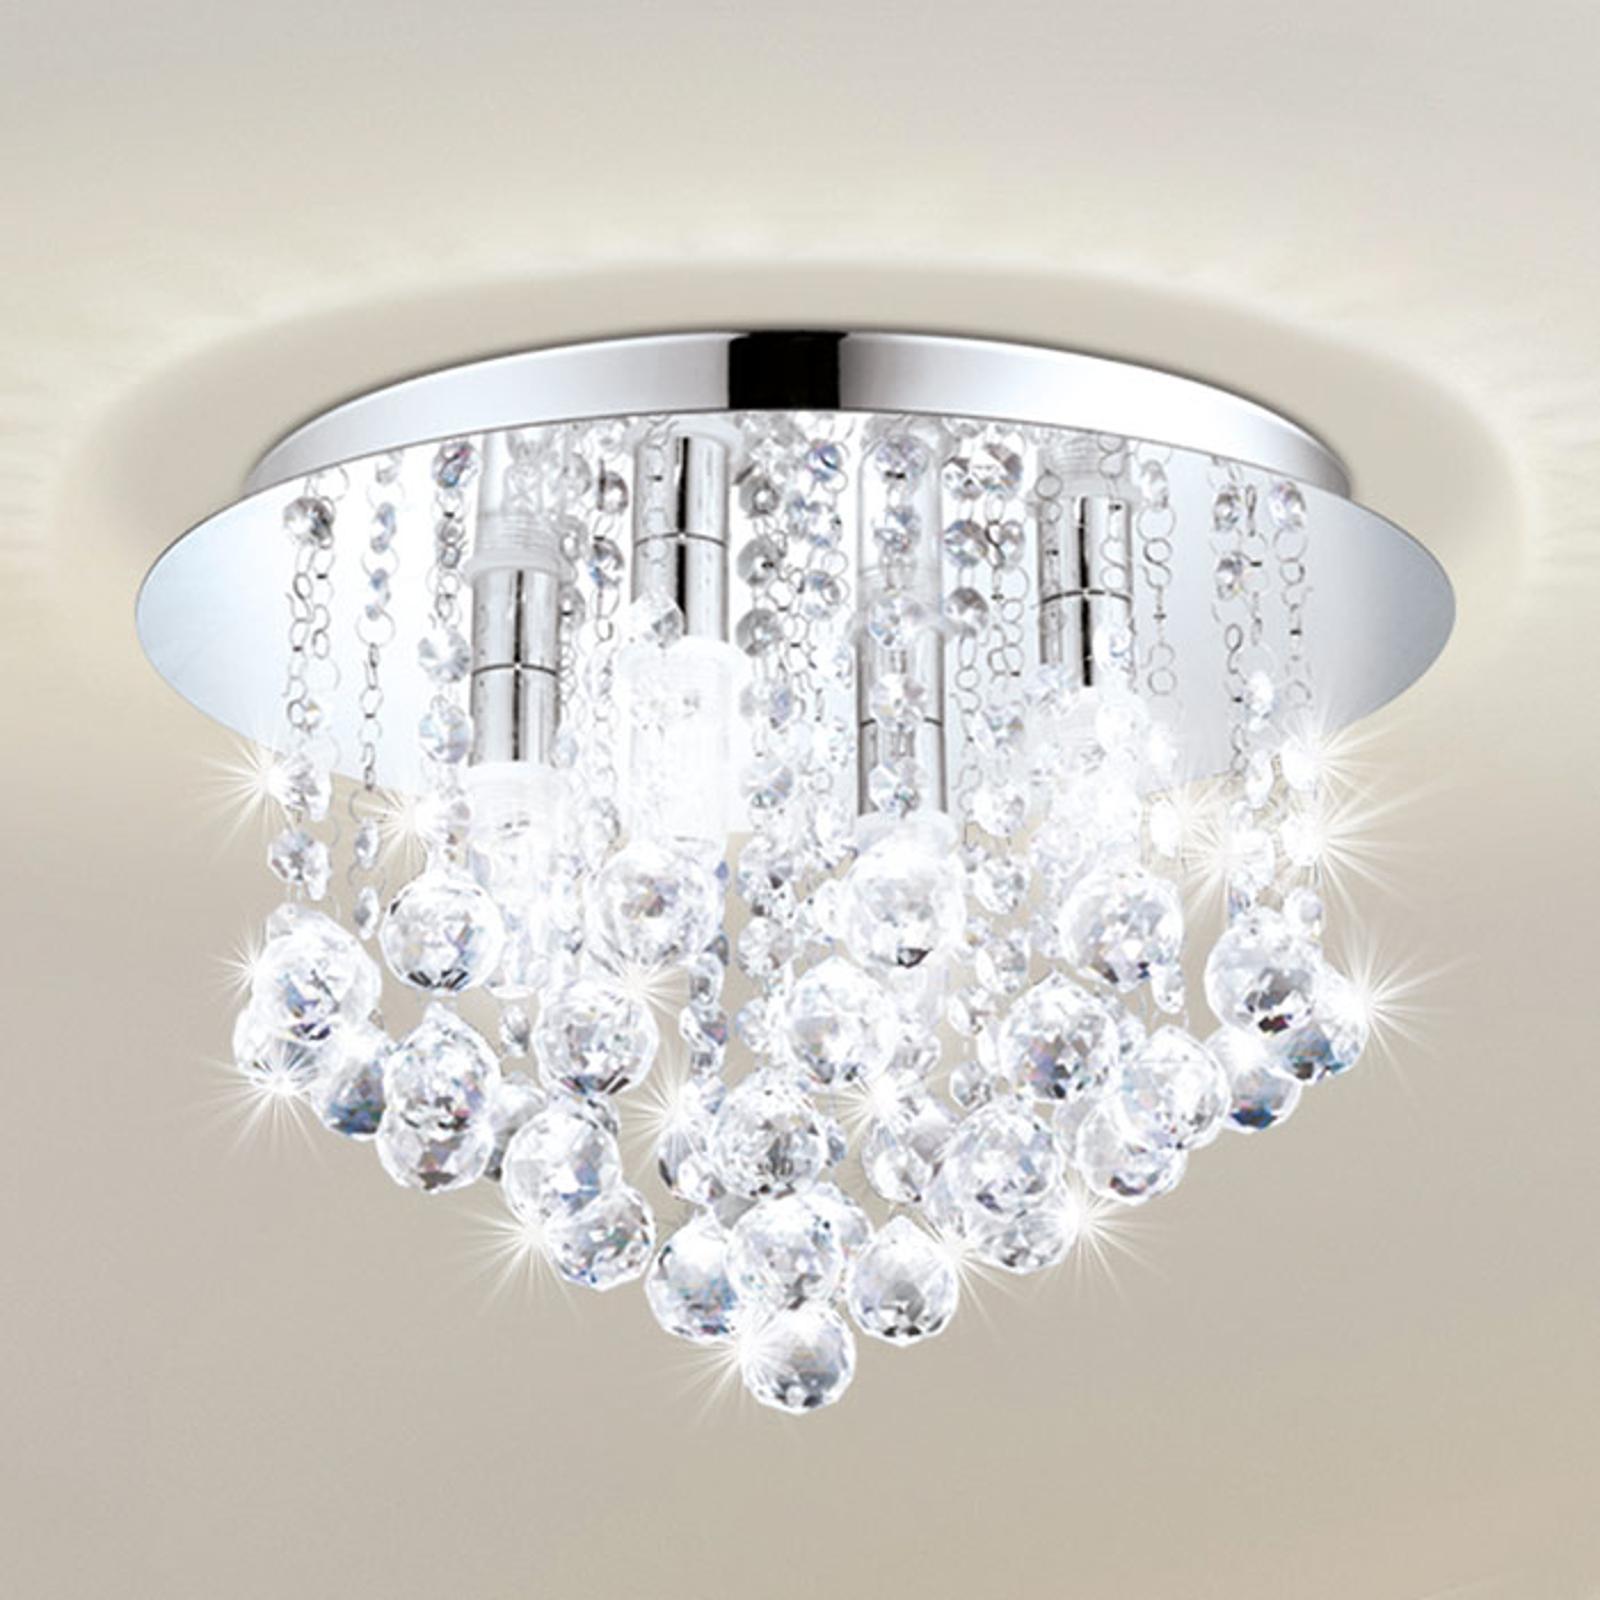 Lampa sufitowa LED Almonte z ozdobami, 50cm